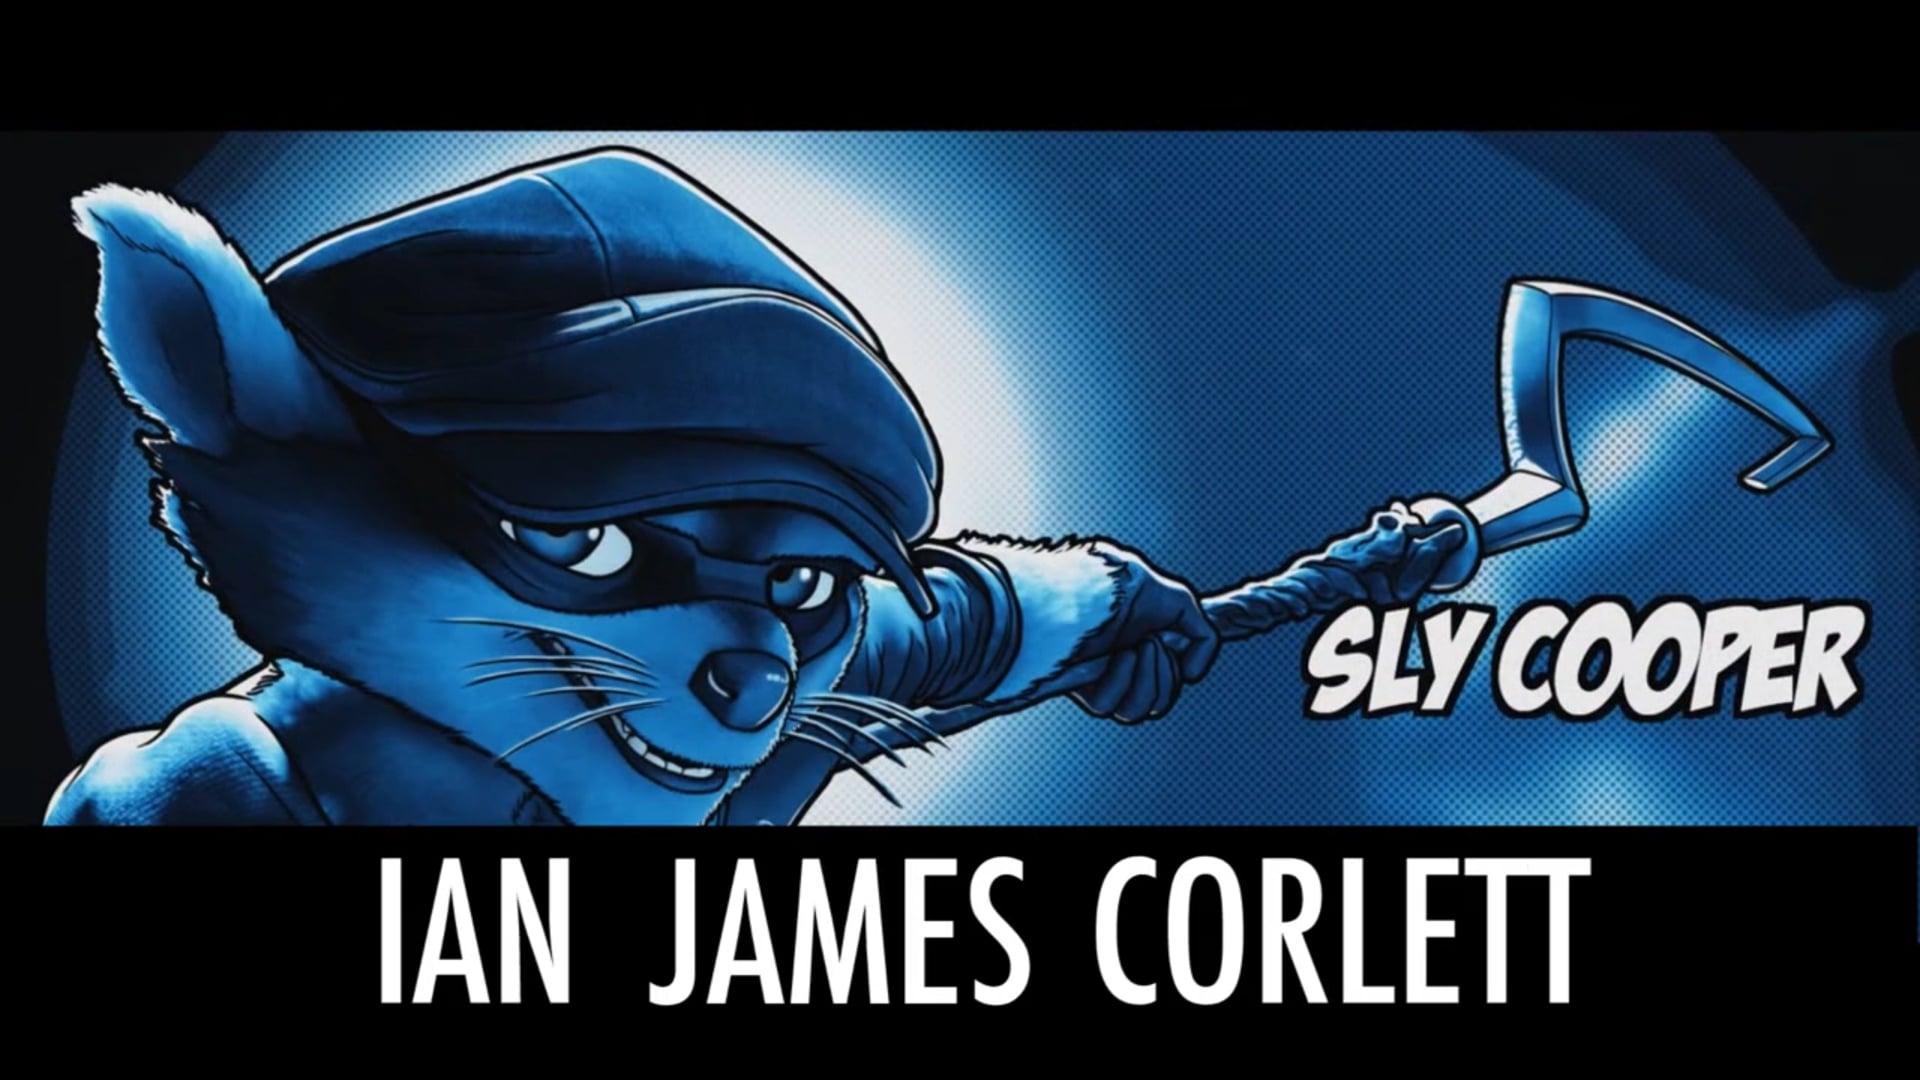 Ian James Corlett Animation reel 2018